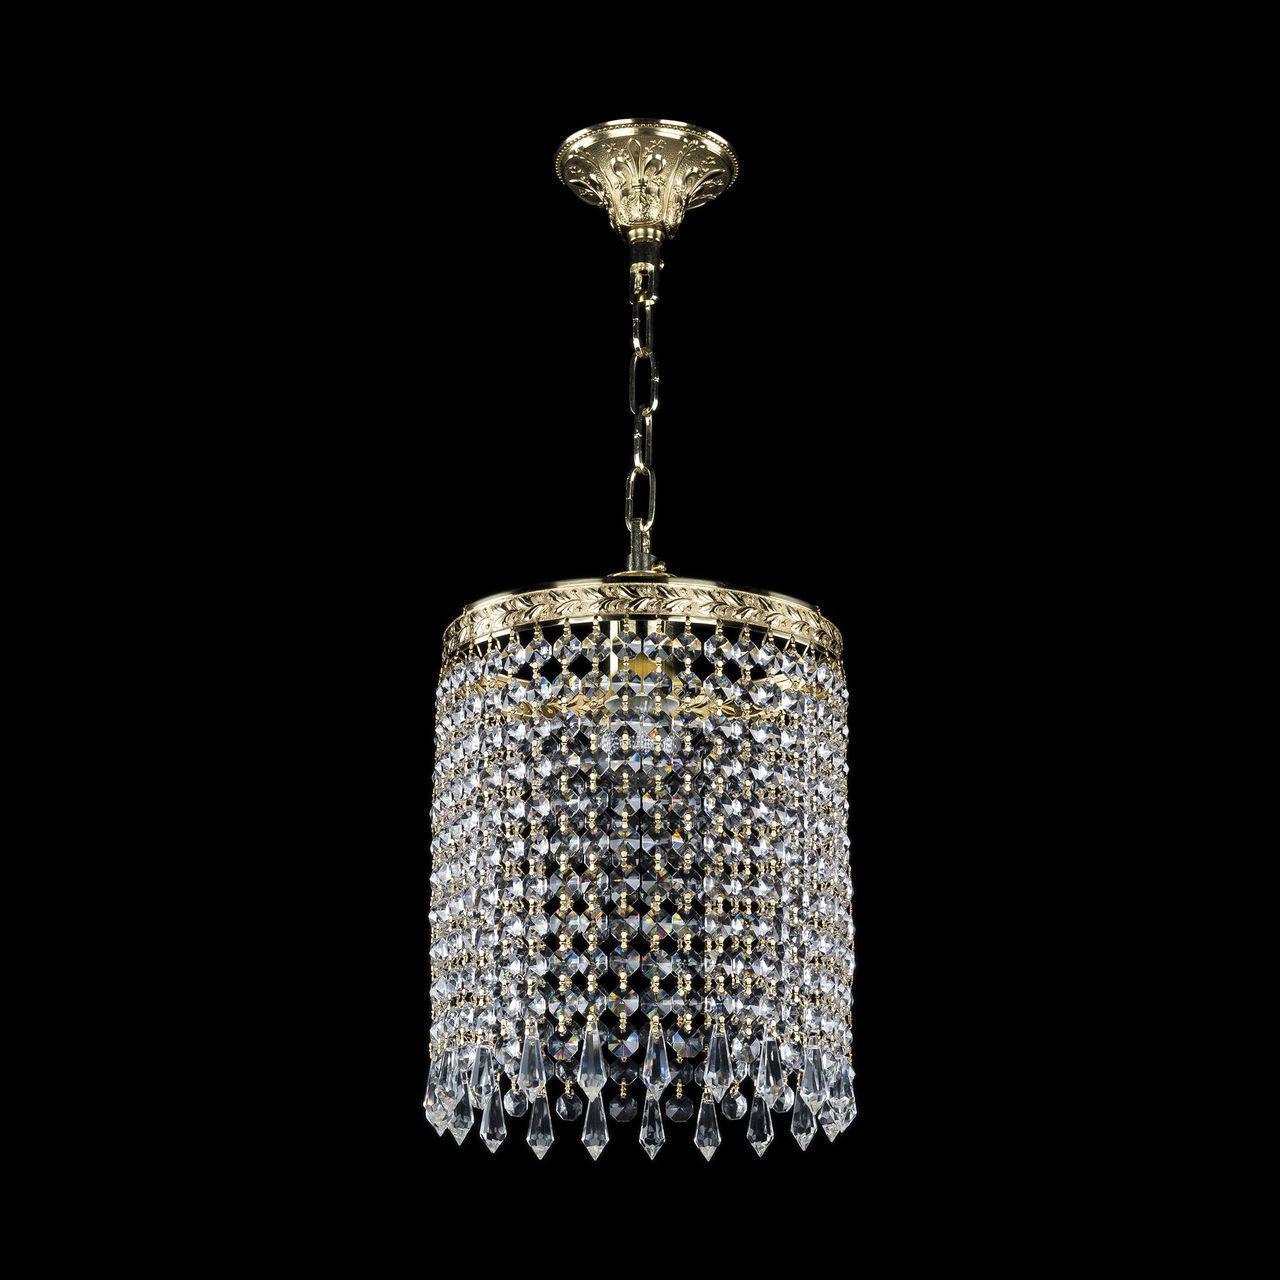 Подвесной светильник Bohemia Ivele 19201/20IV G Drops